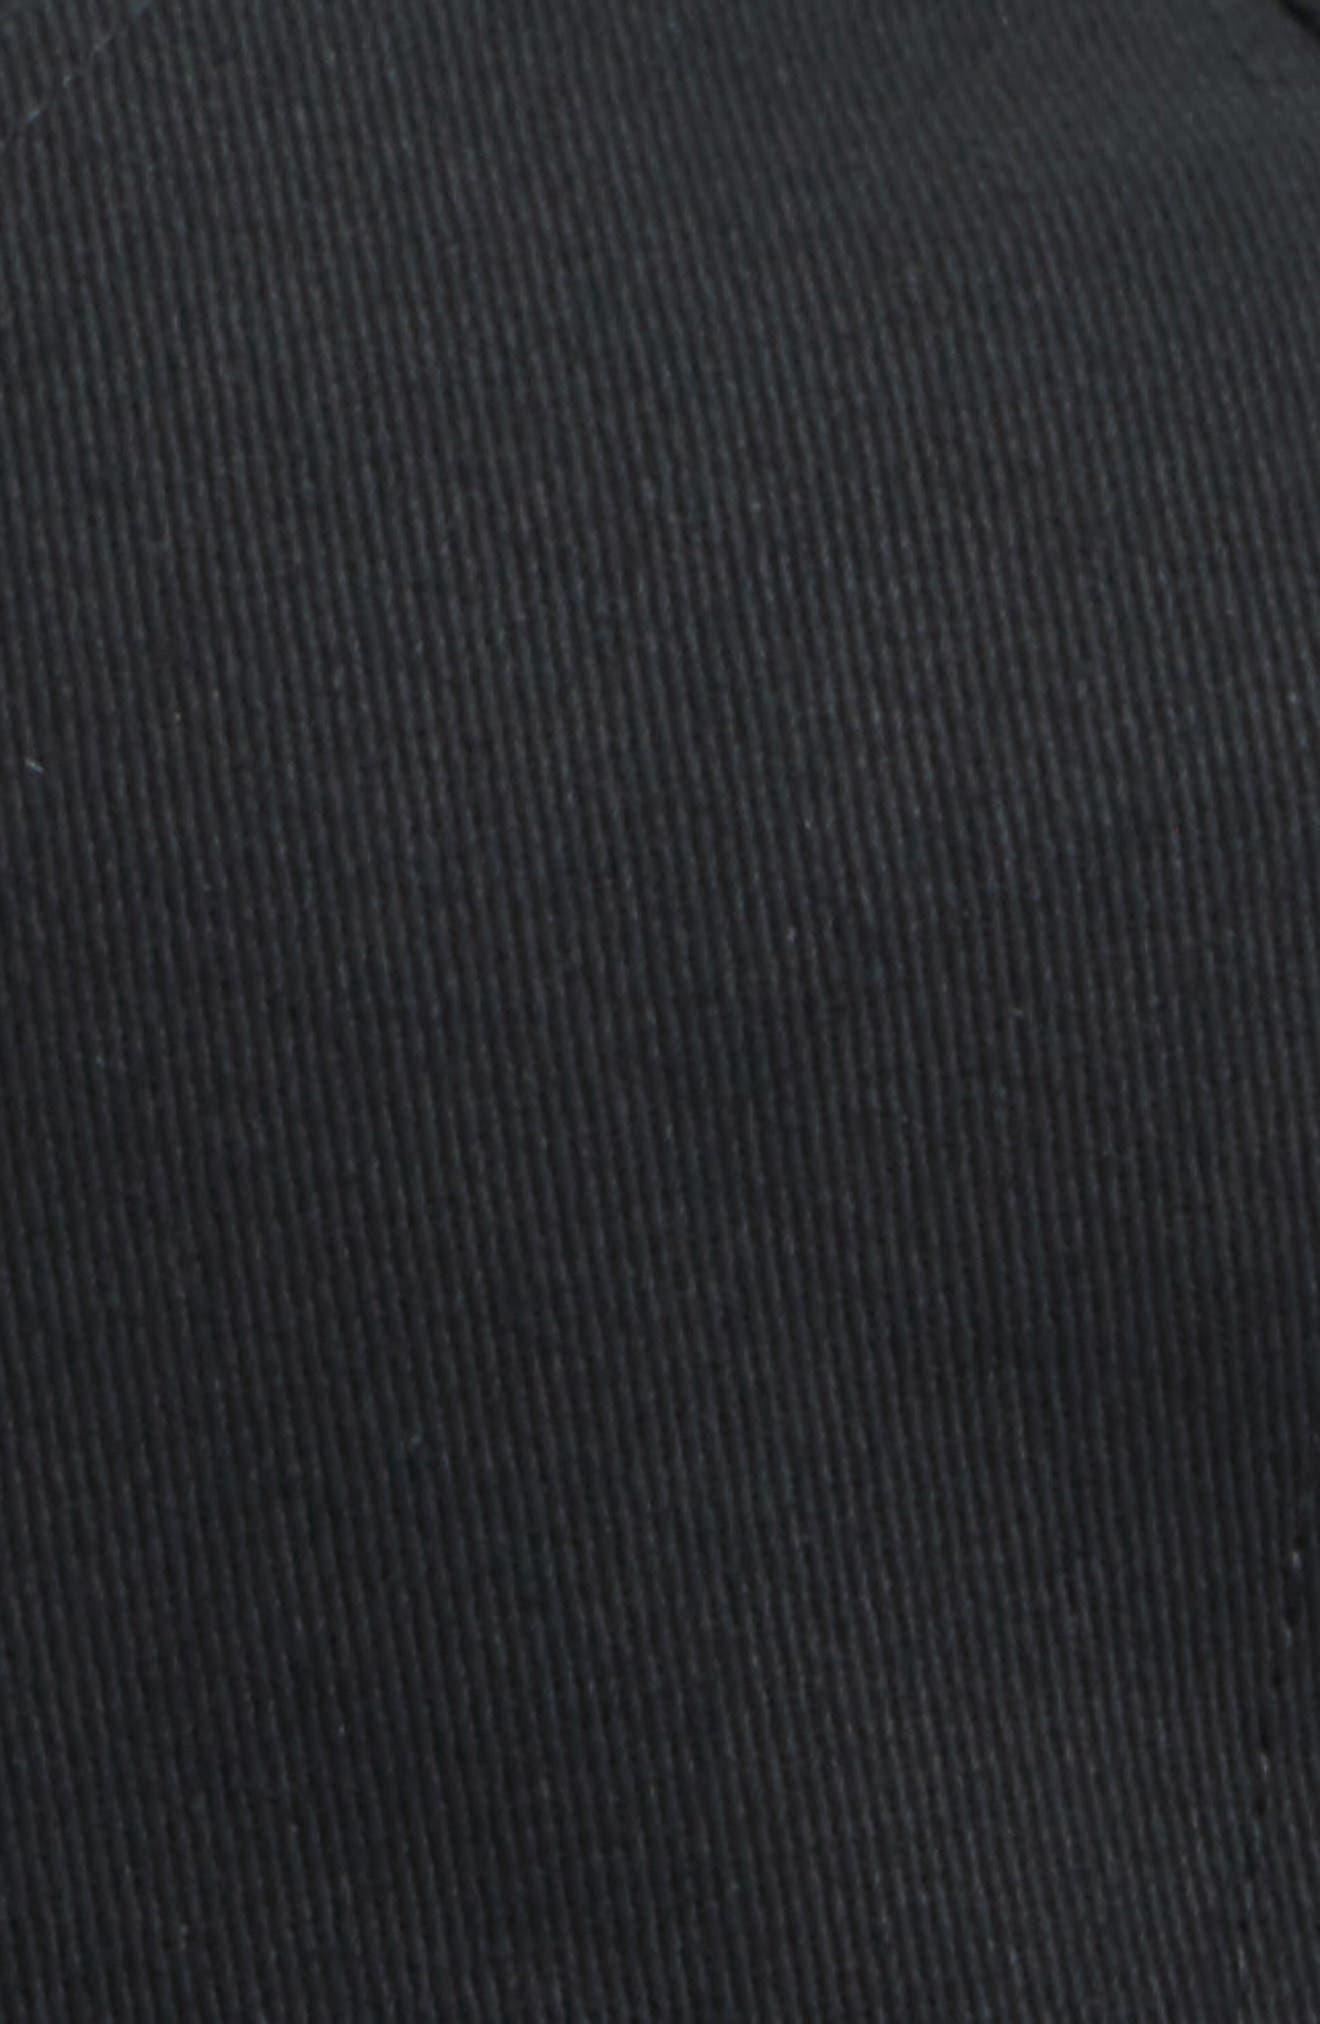 BP.,                             Cotton Ball Cap,                             Alternate thumbnail 2, color,                             001